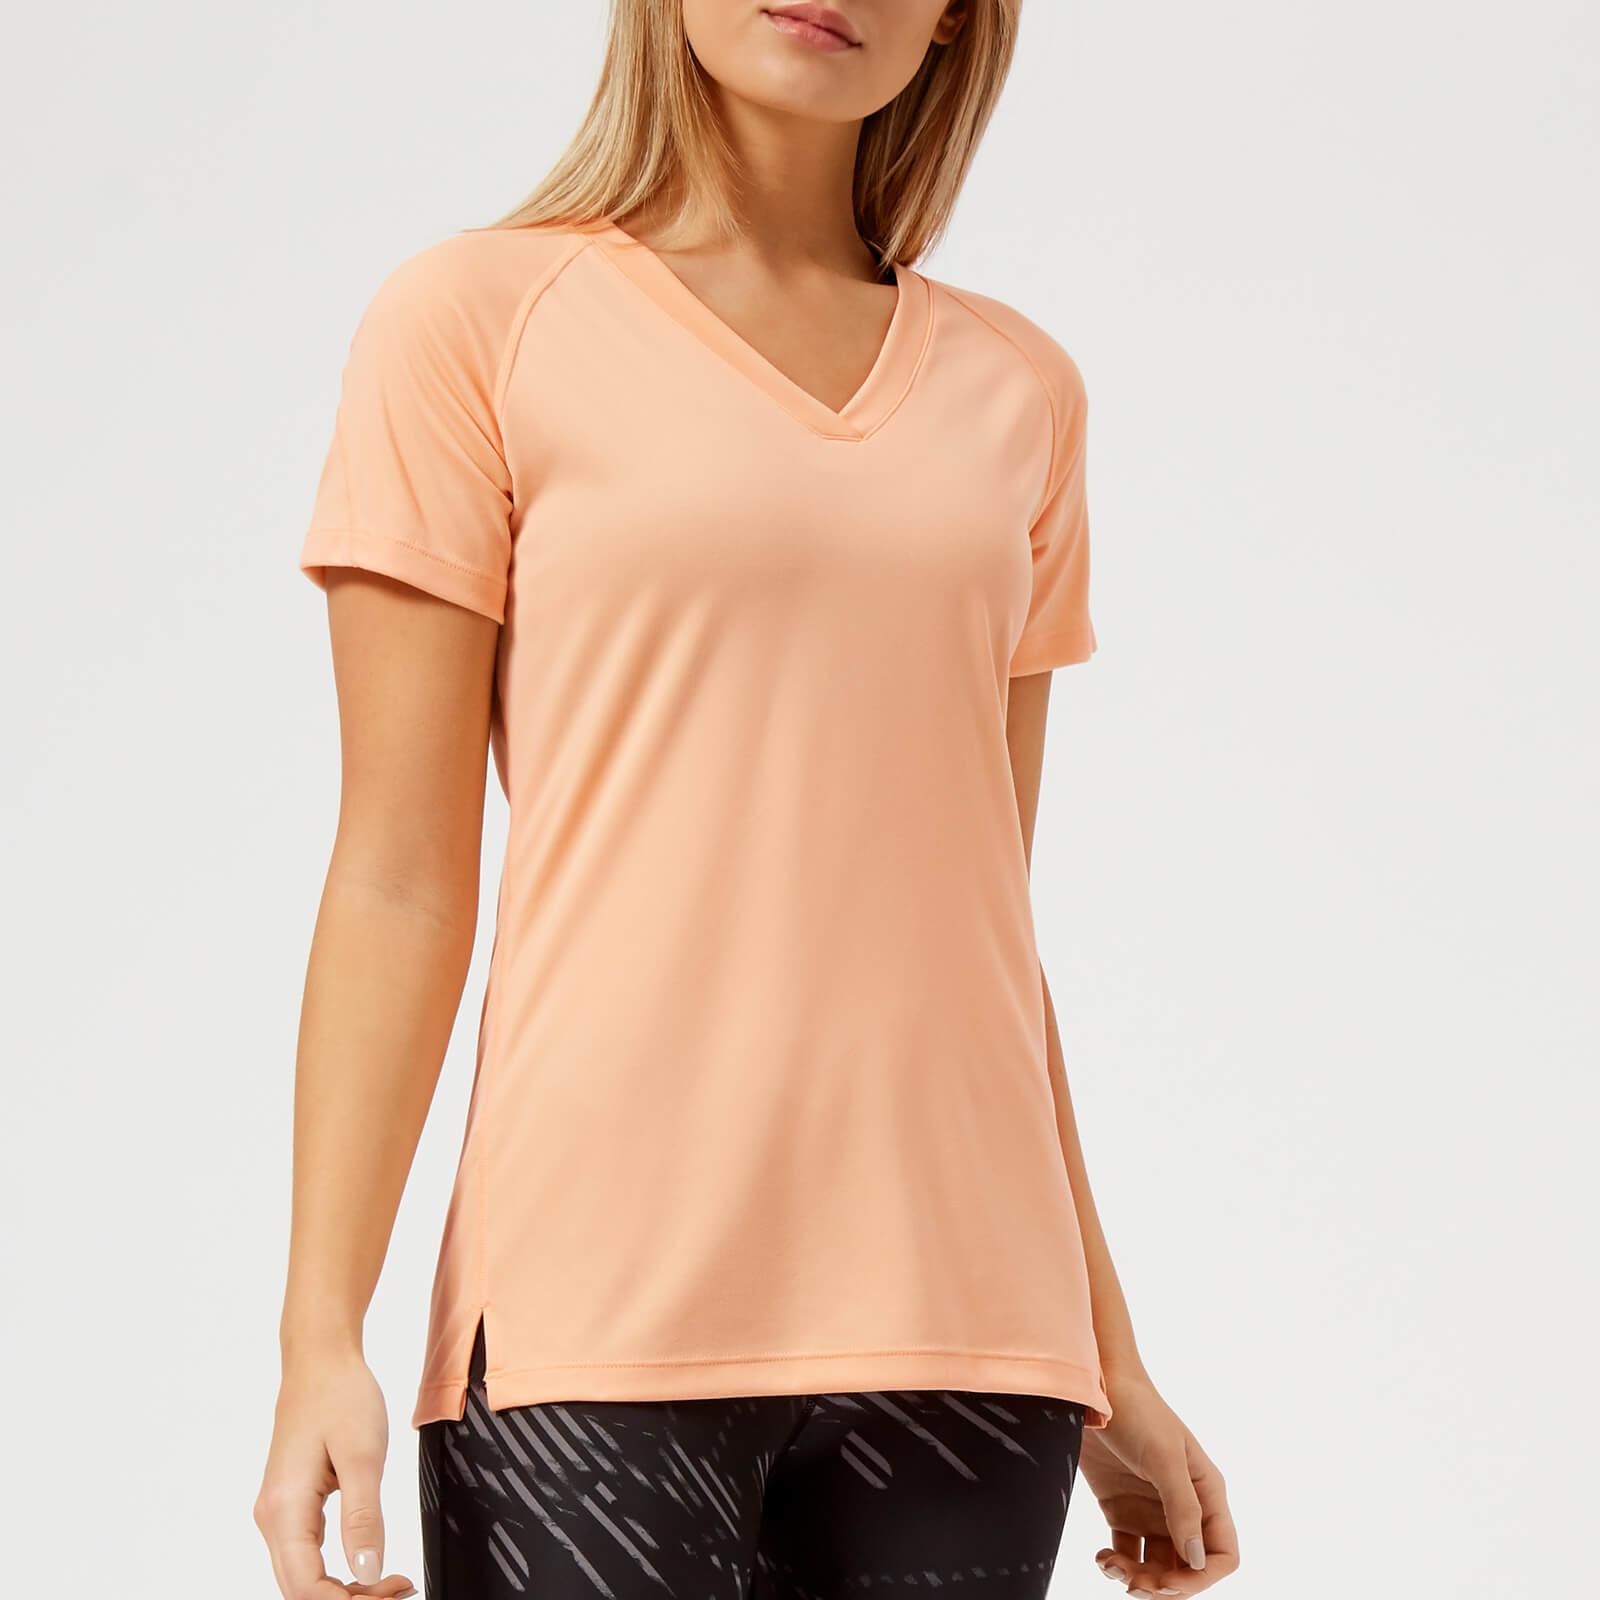 499862480c93 Asics Running Women's V Neck Short Sleeve Top - Apricot Ice Sports &  Leisure   TheHut.com